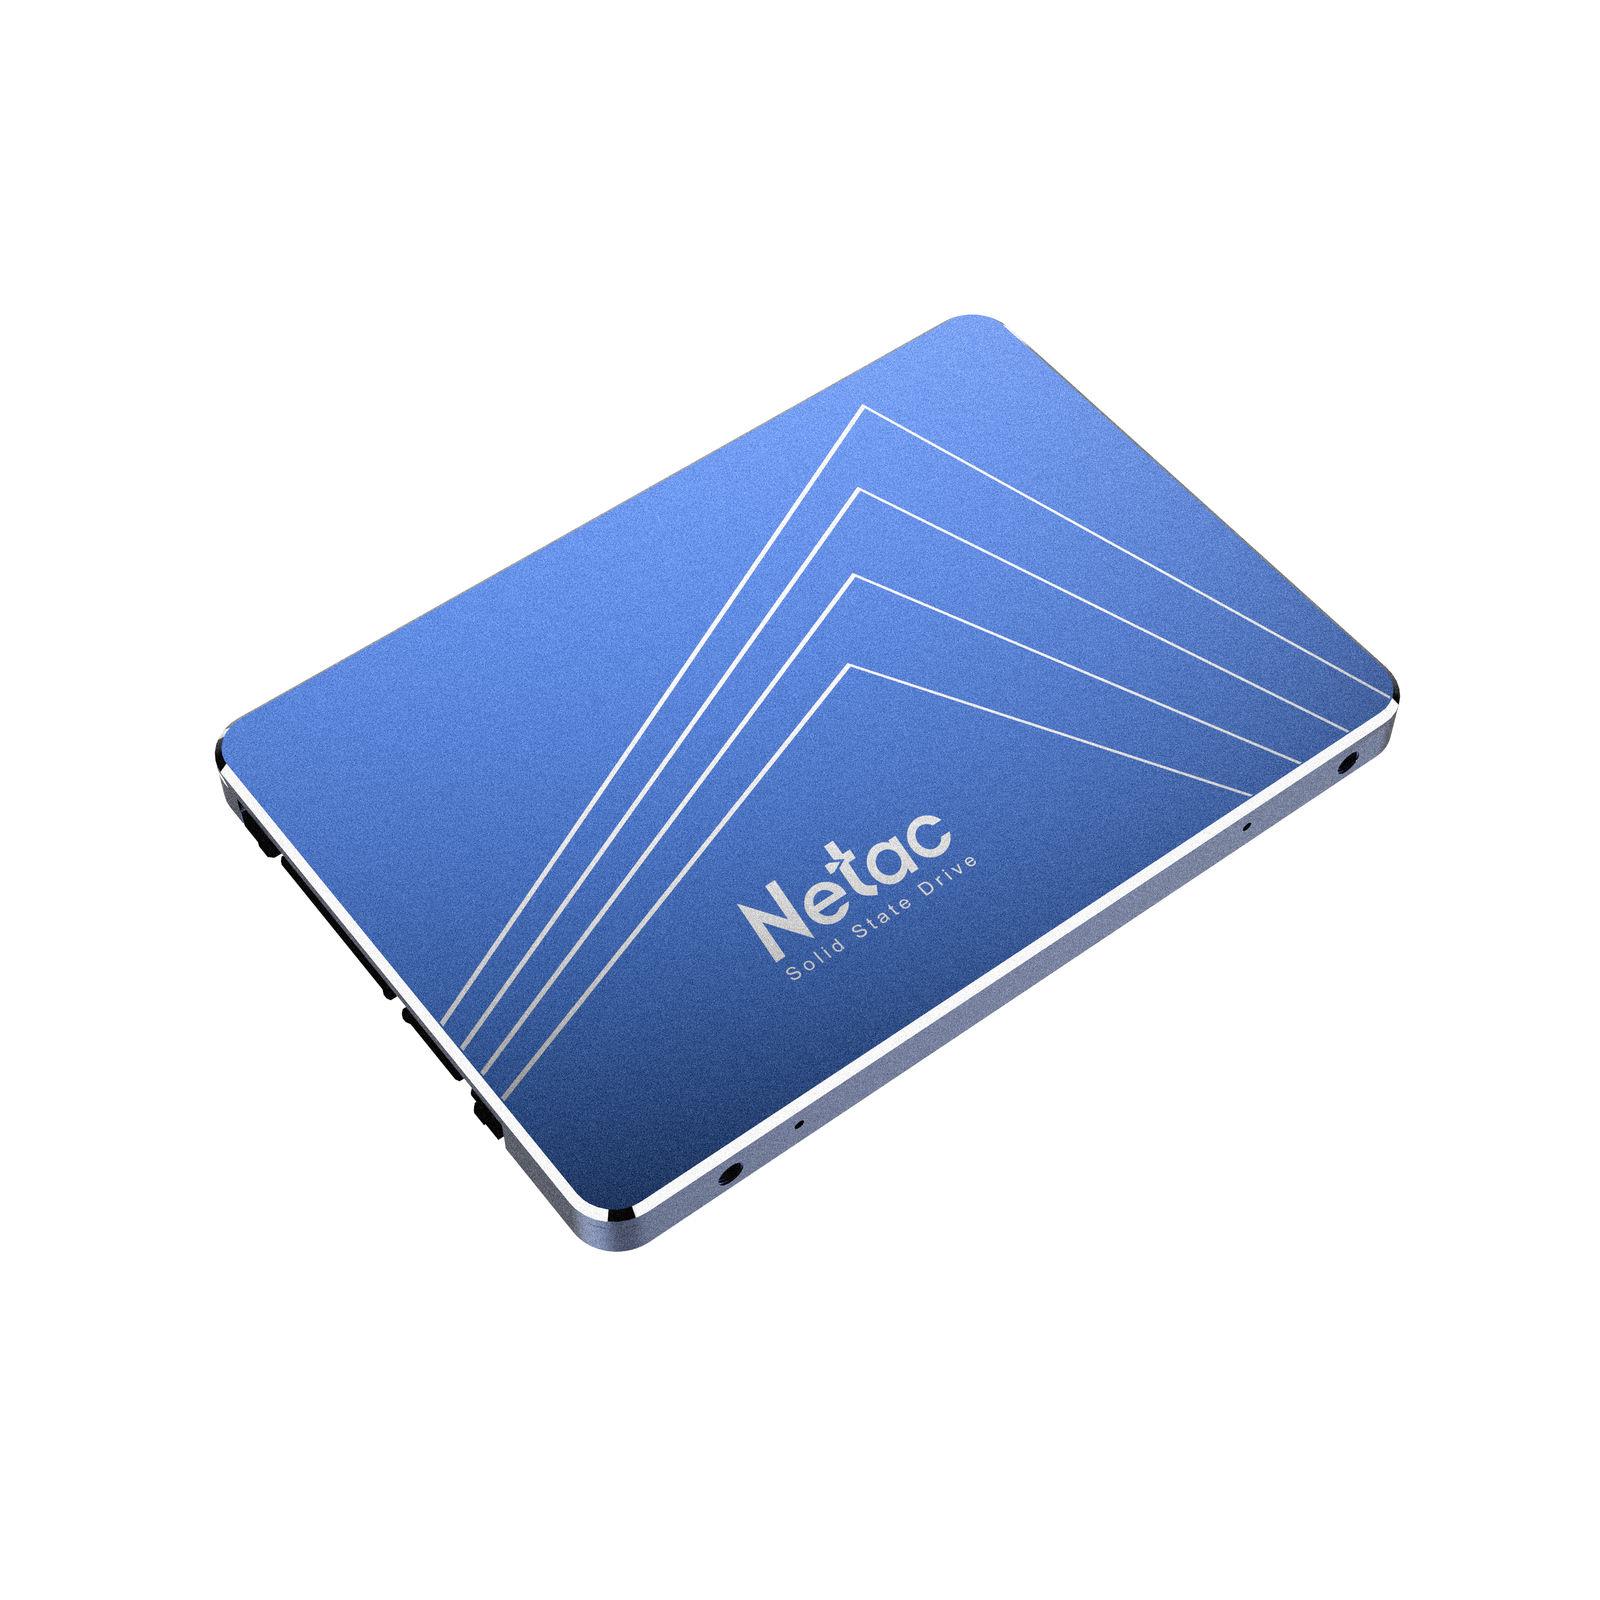 SSD interne Netac N600S (SATA 3) - 720 Go